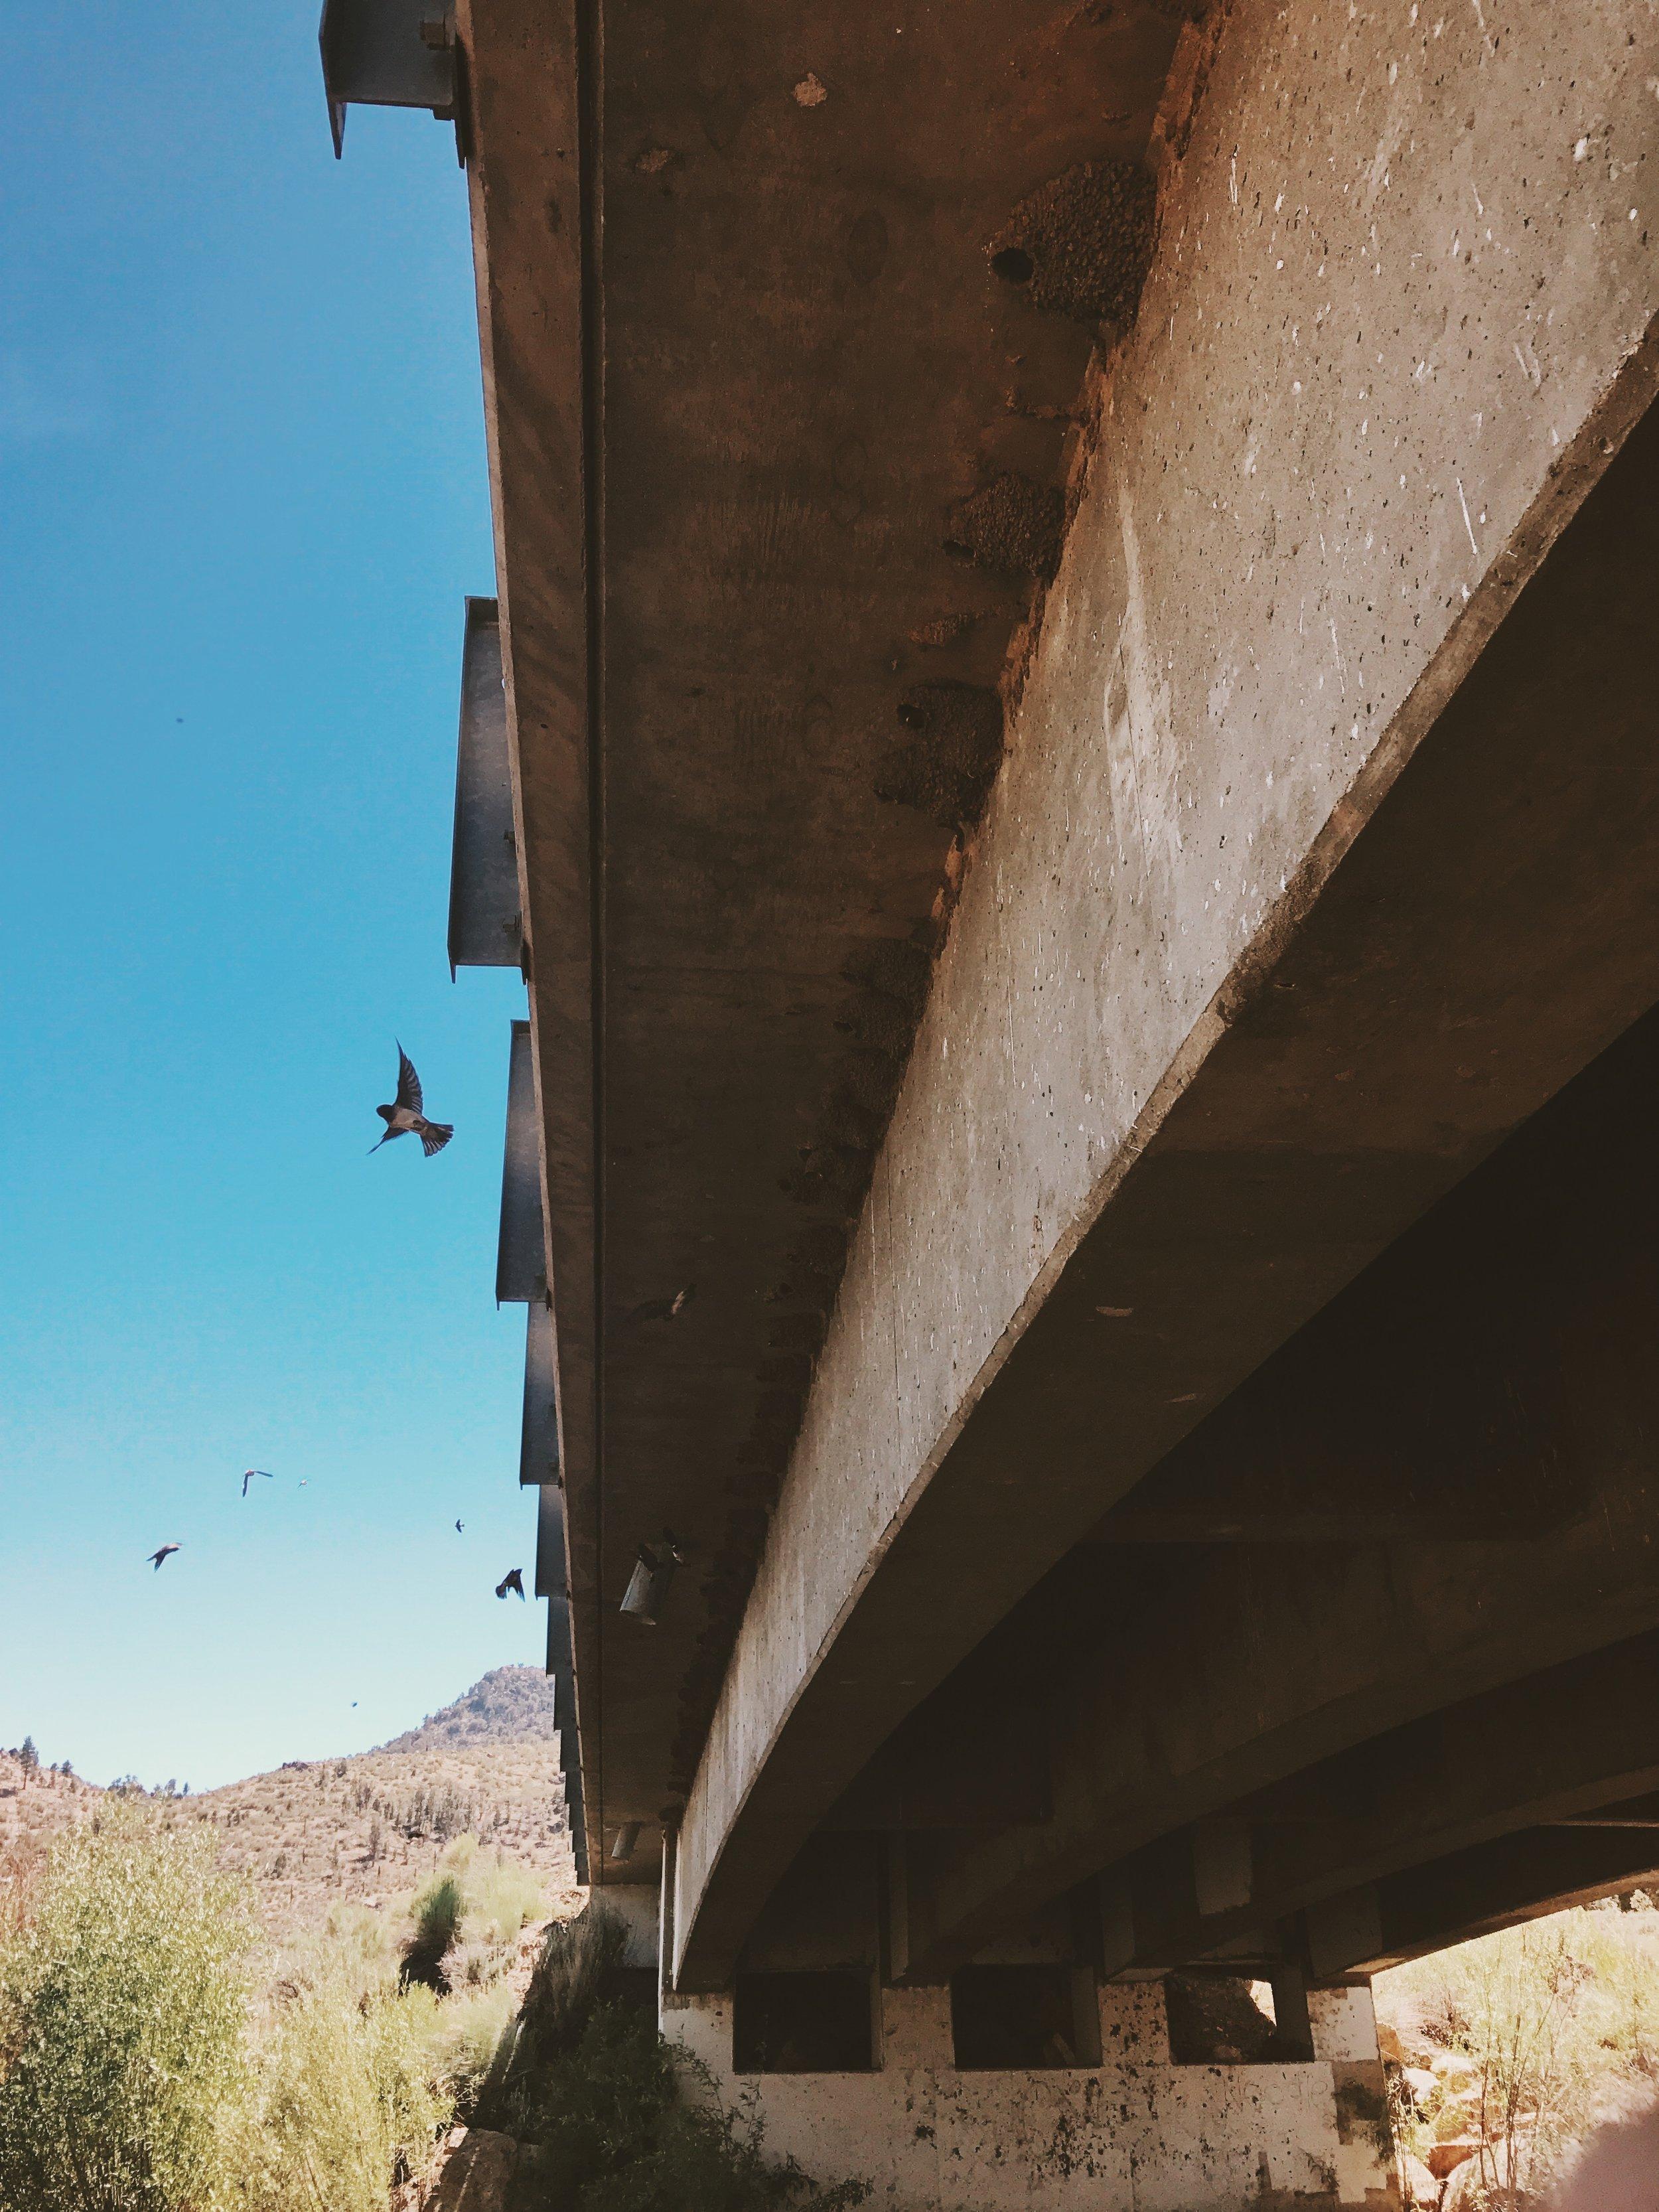 Sparrows make cool little nests under the bridge